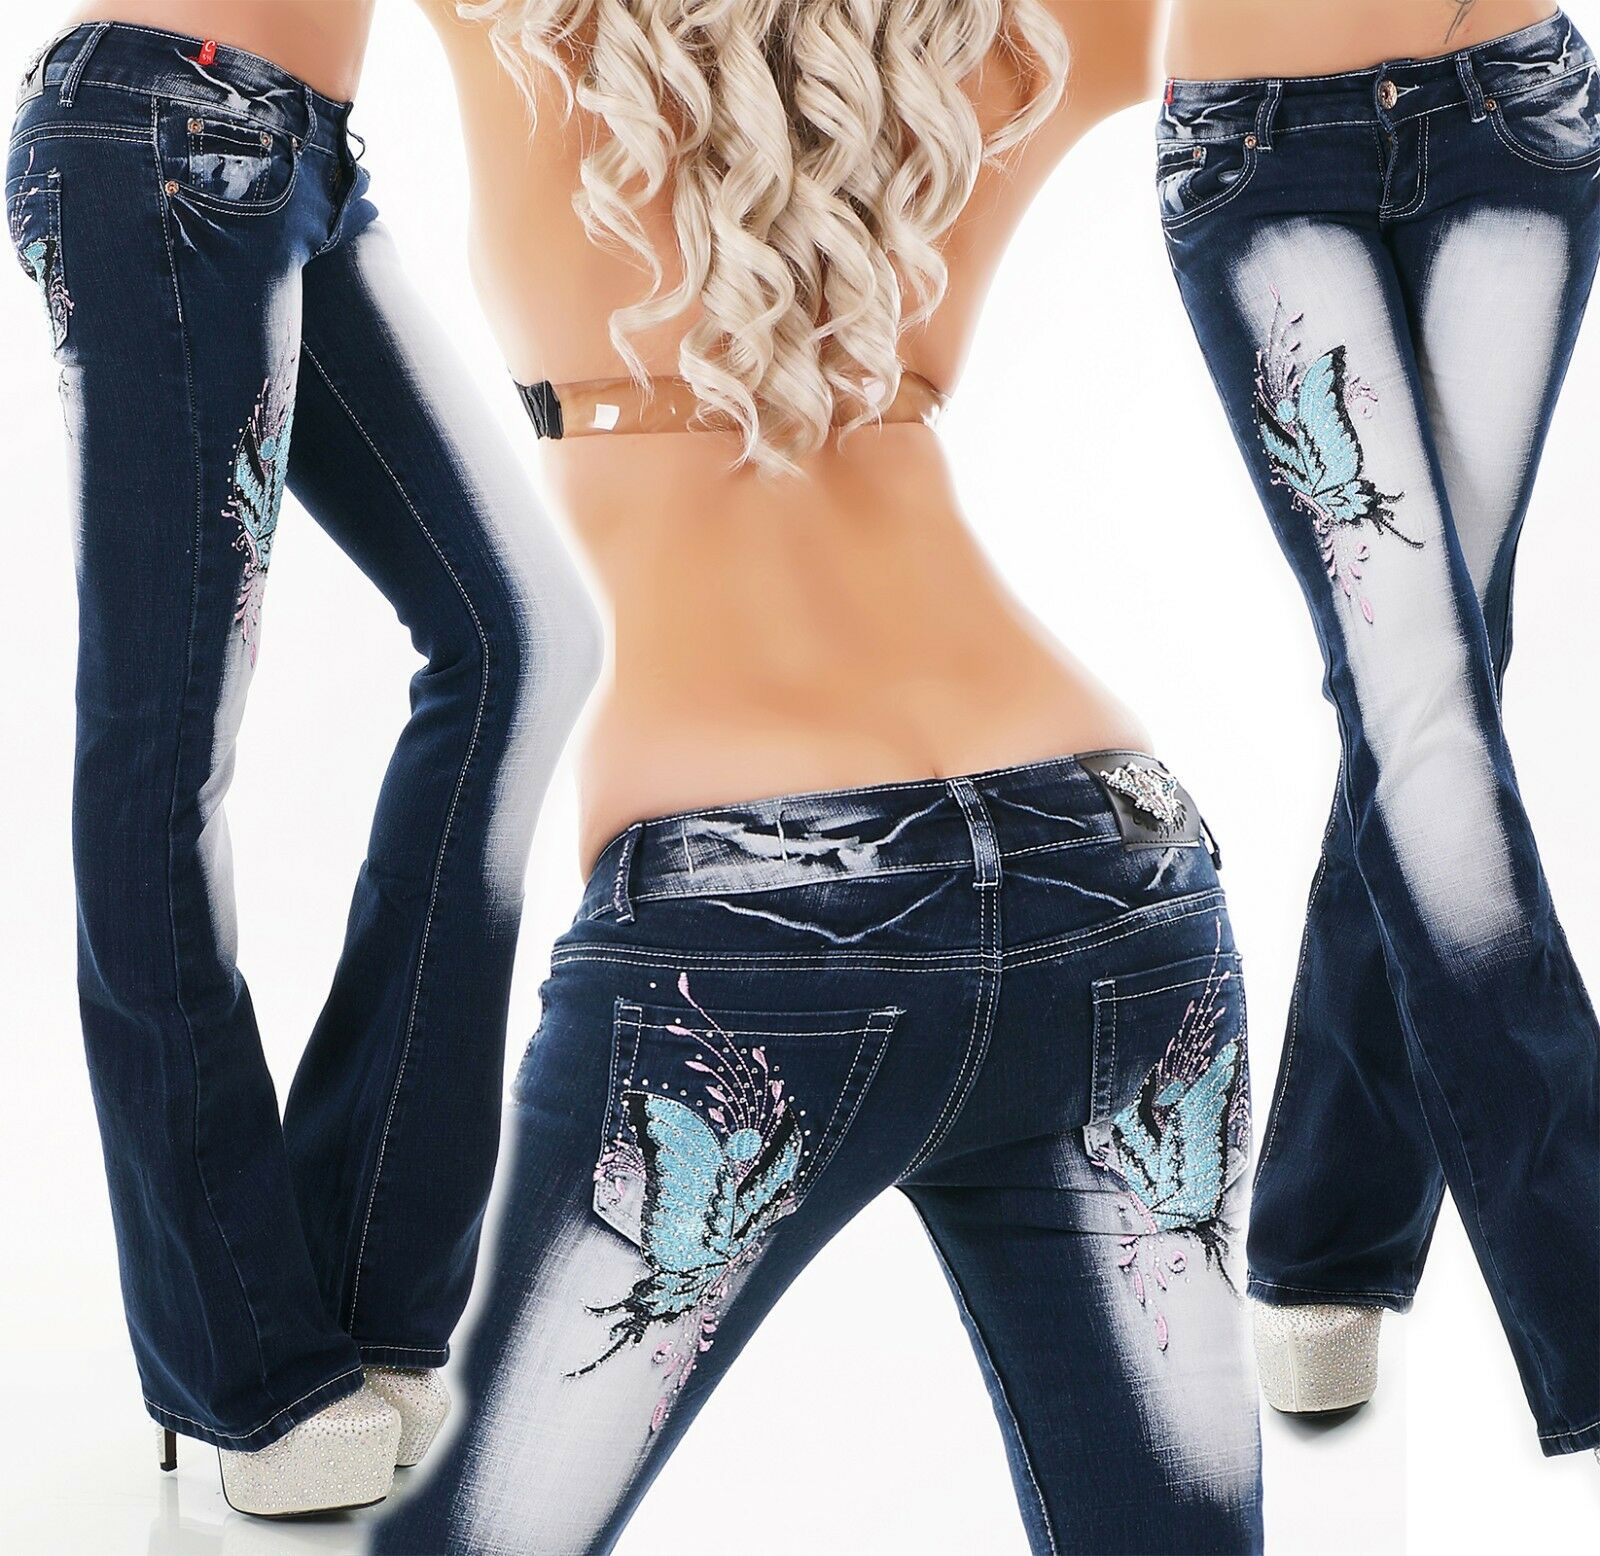 Crazy Age bluee Butterflies Bootcut Jeans - XS S M L XL